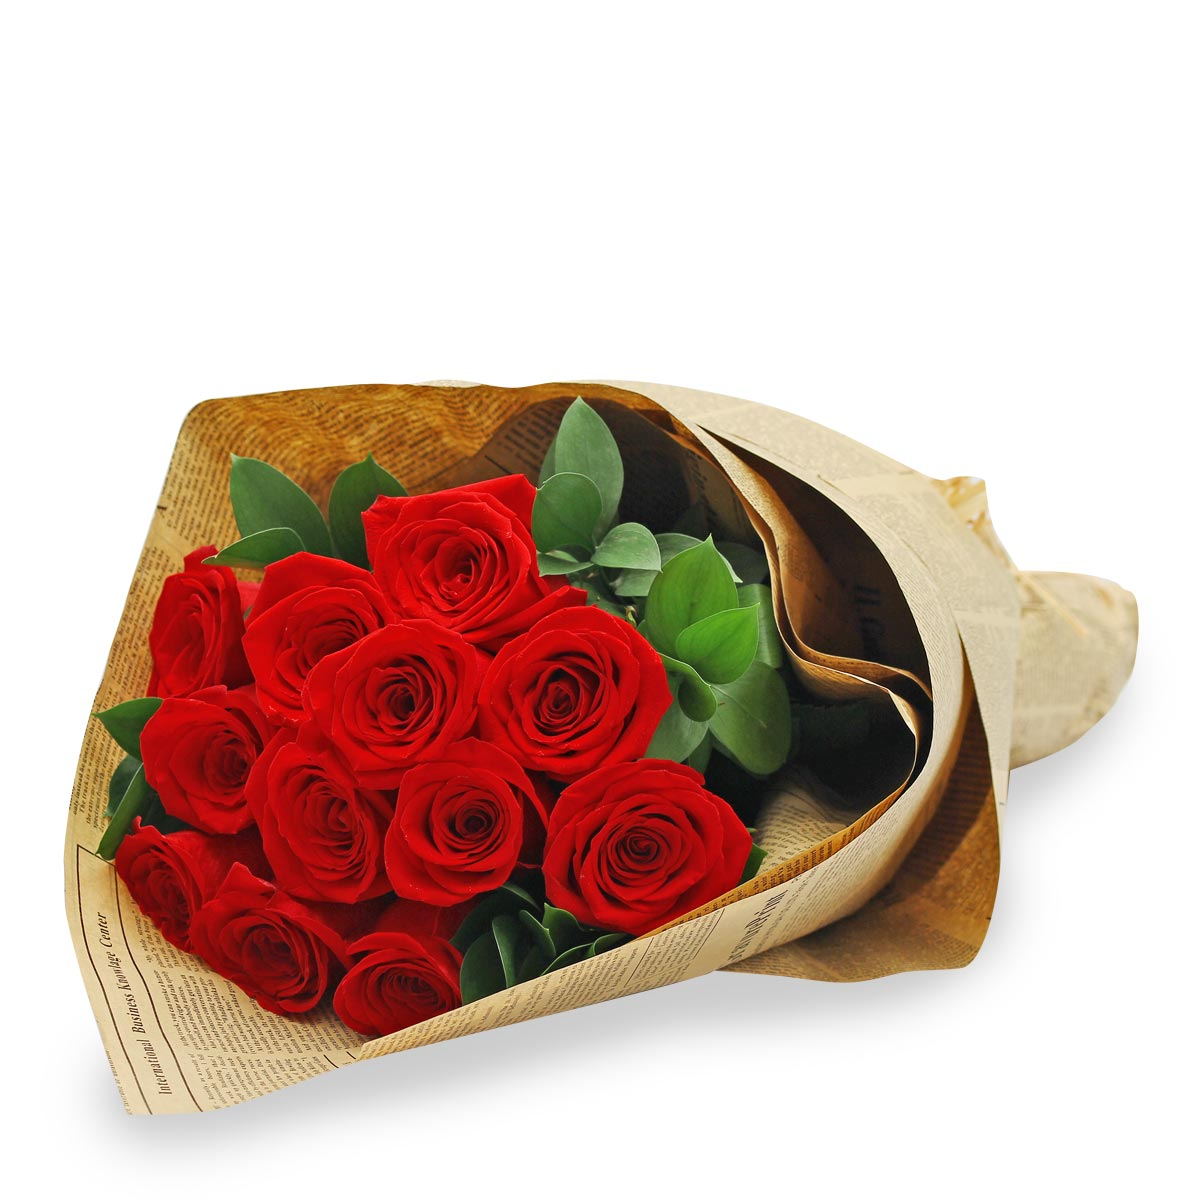 BQ1751 scarlet roses red roses